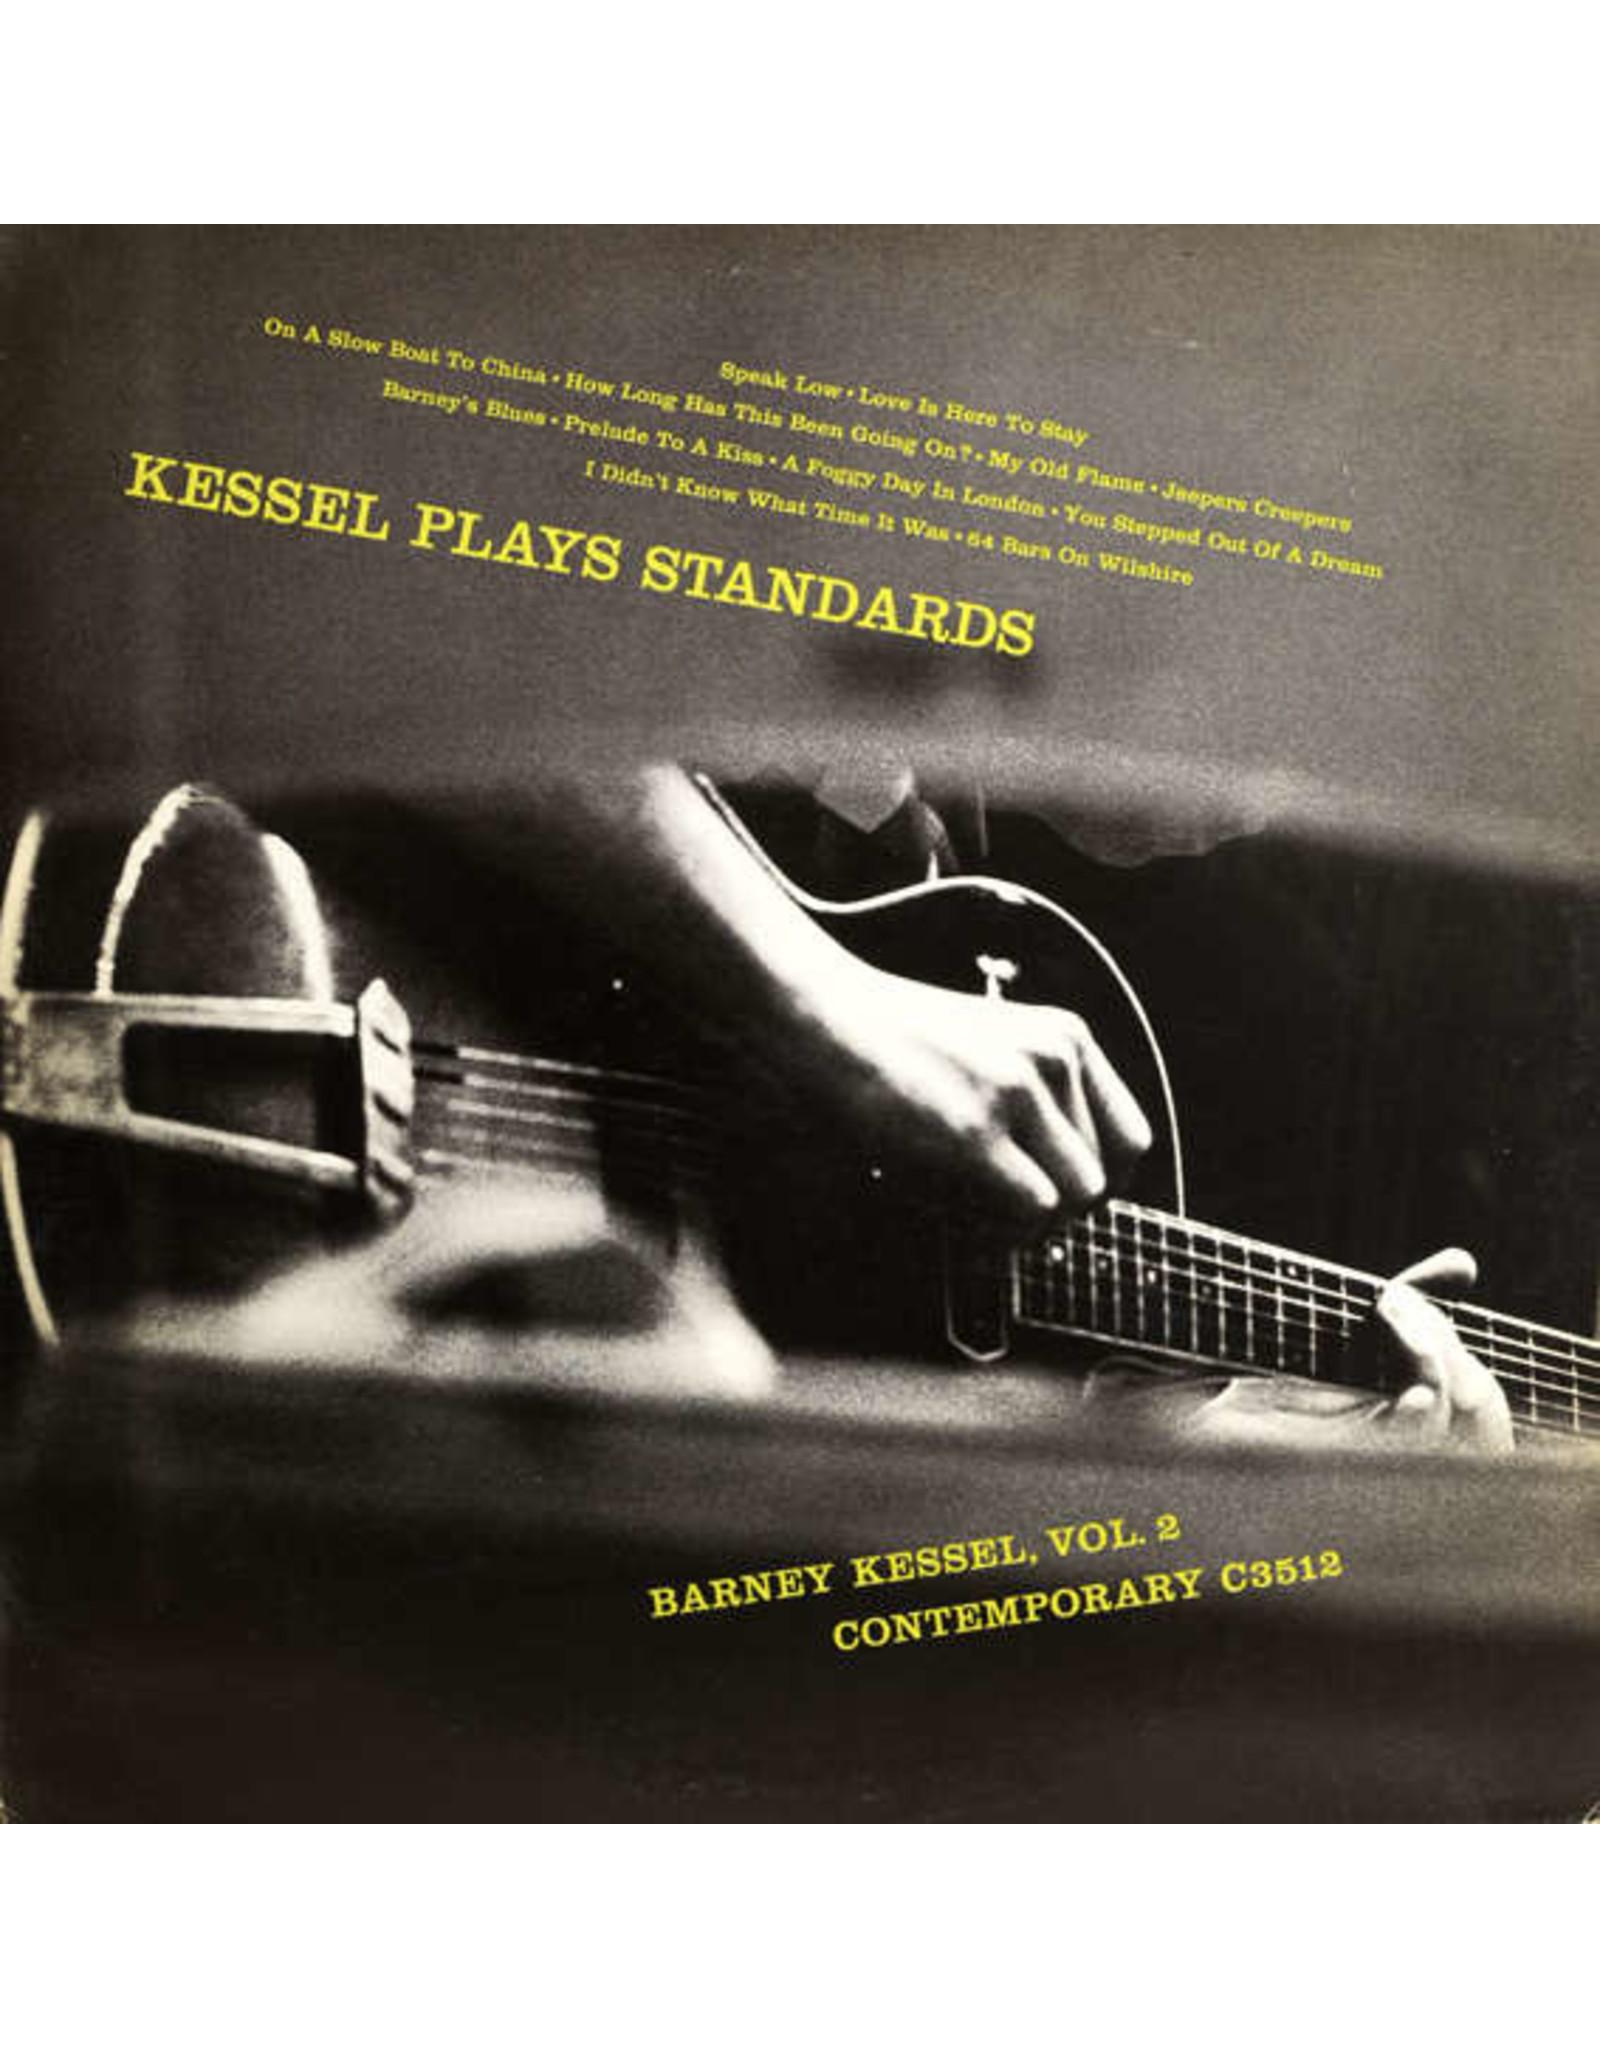 Barney Kessel - Kessel Plays Standards